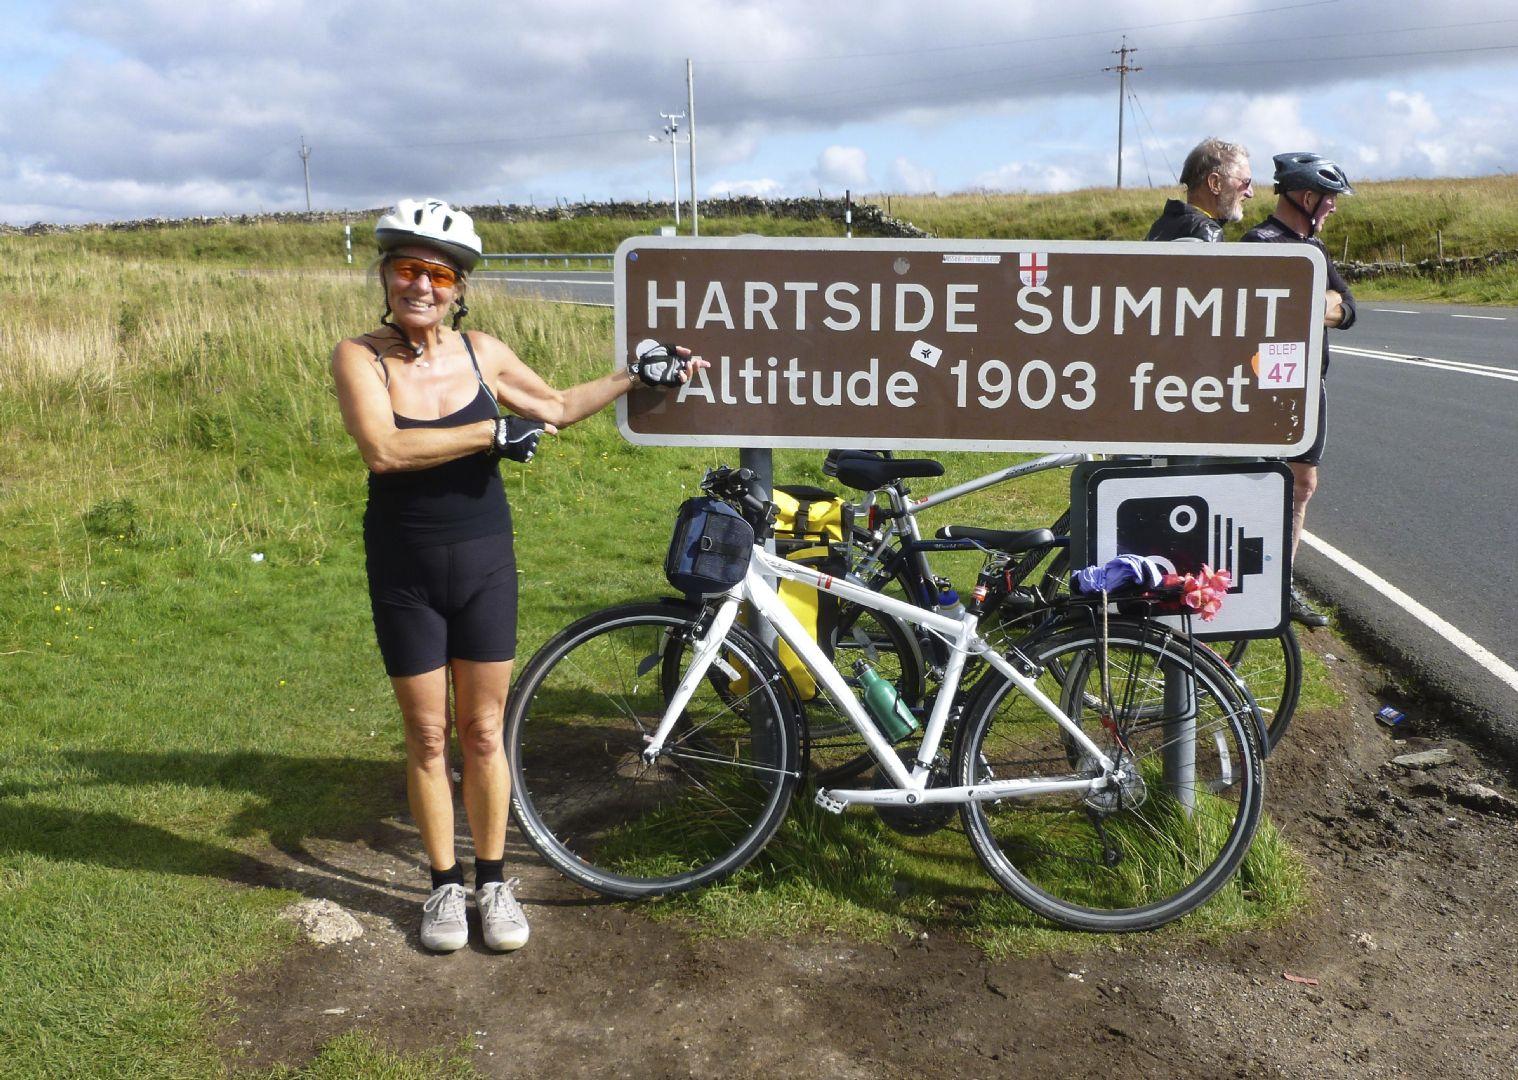 _Customer.36813.6976.jpg - UK - C2C - Coast to Coast 4 Days Cycling - Self-Guided Leisure Cycling Holiday - Leisure Cycling